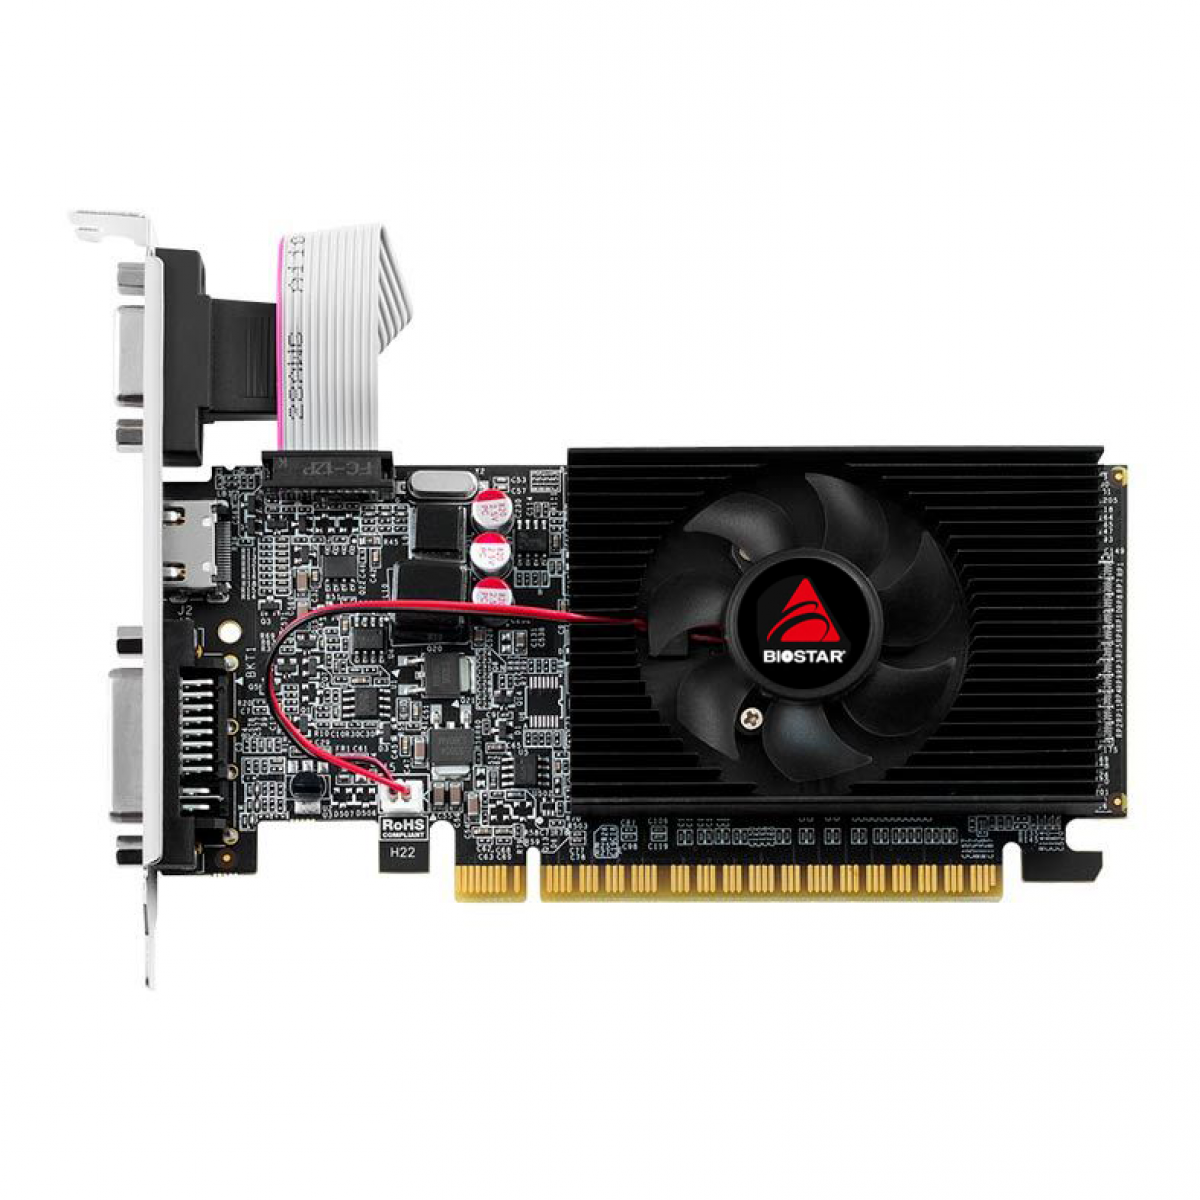 Kit Upgrade Biostar GeForce GT 710 + AMD Ryzen 5 3500 + Memória DDR4 16GB (2x8GB) 3000Mhz